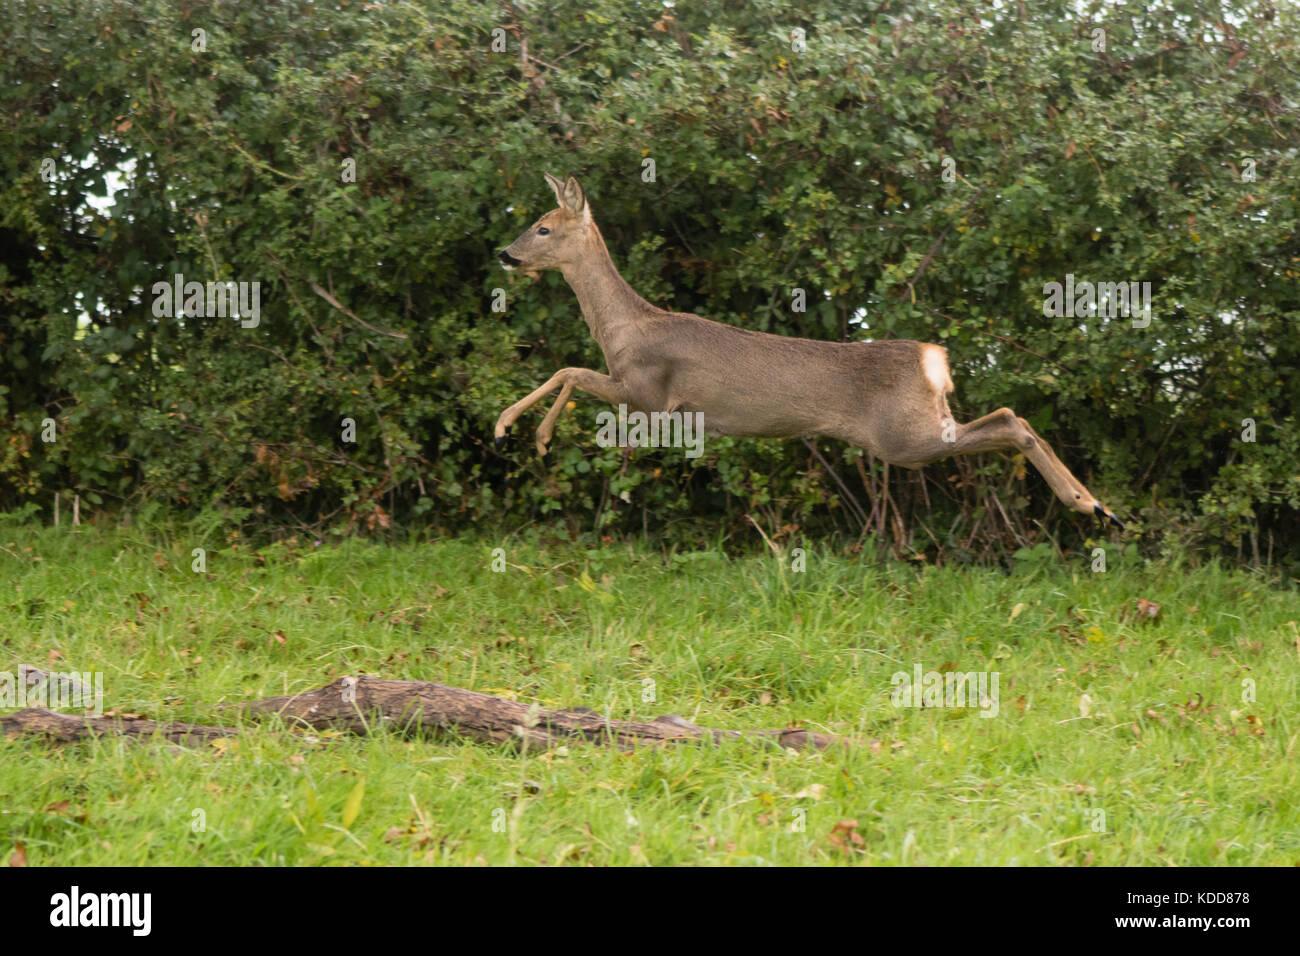 Roe deer (Capreolus capreolus) doe leaping. Small elegant deer in family Cervidae, showing white rump in the air - Stock Image